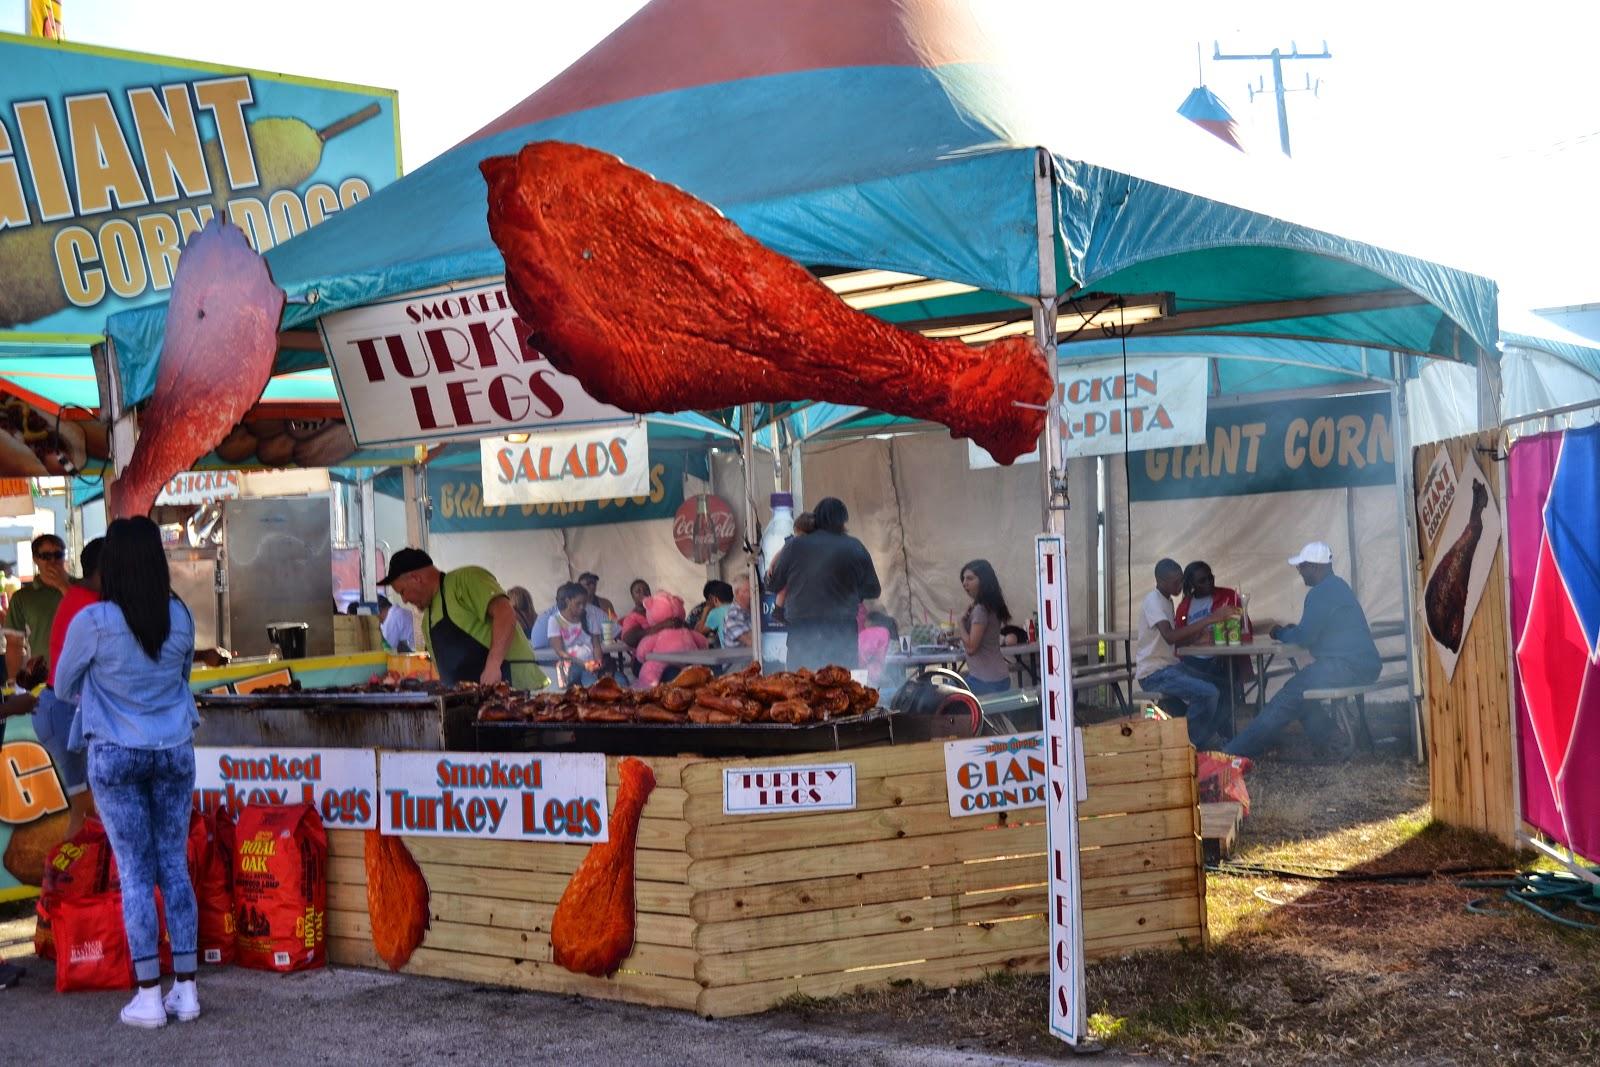 South Florida Fair 2015 food family rides music www.sandysandhu.co